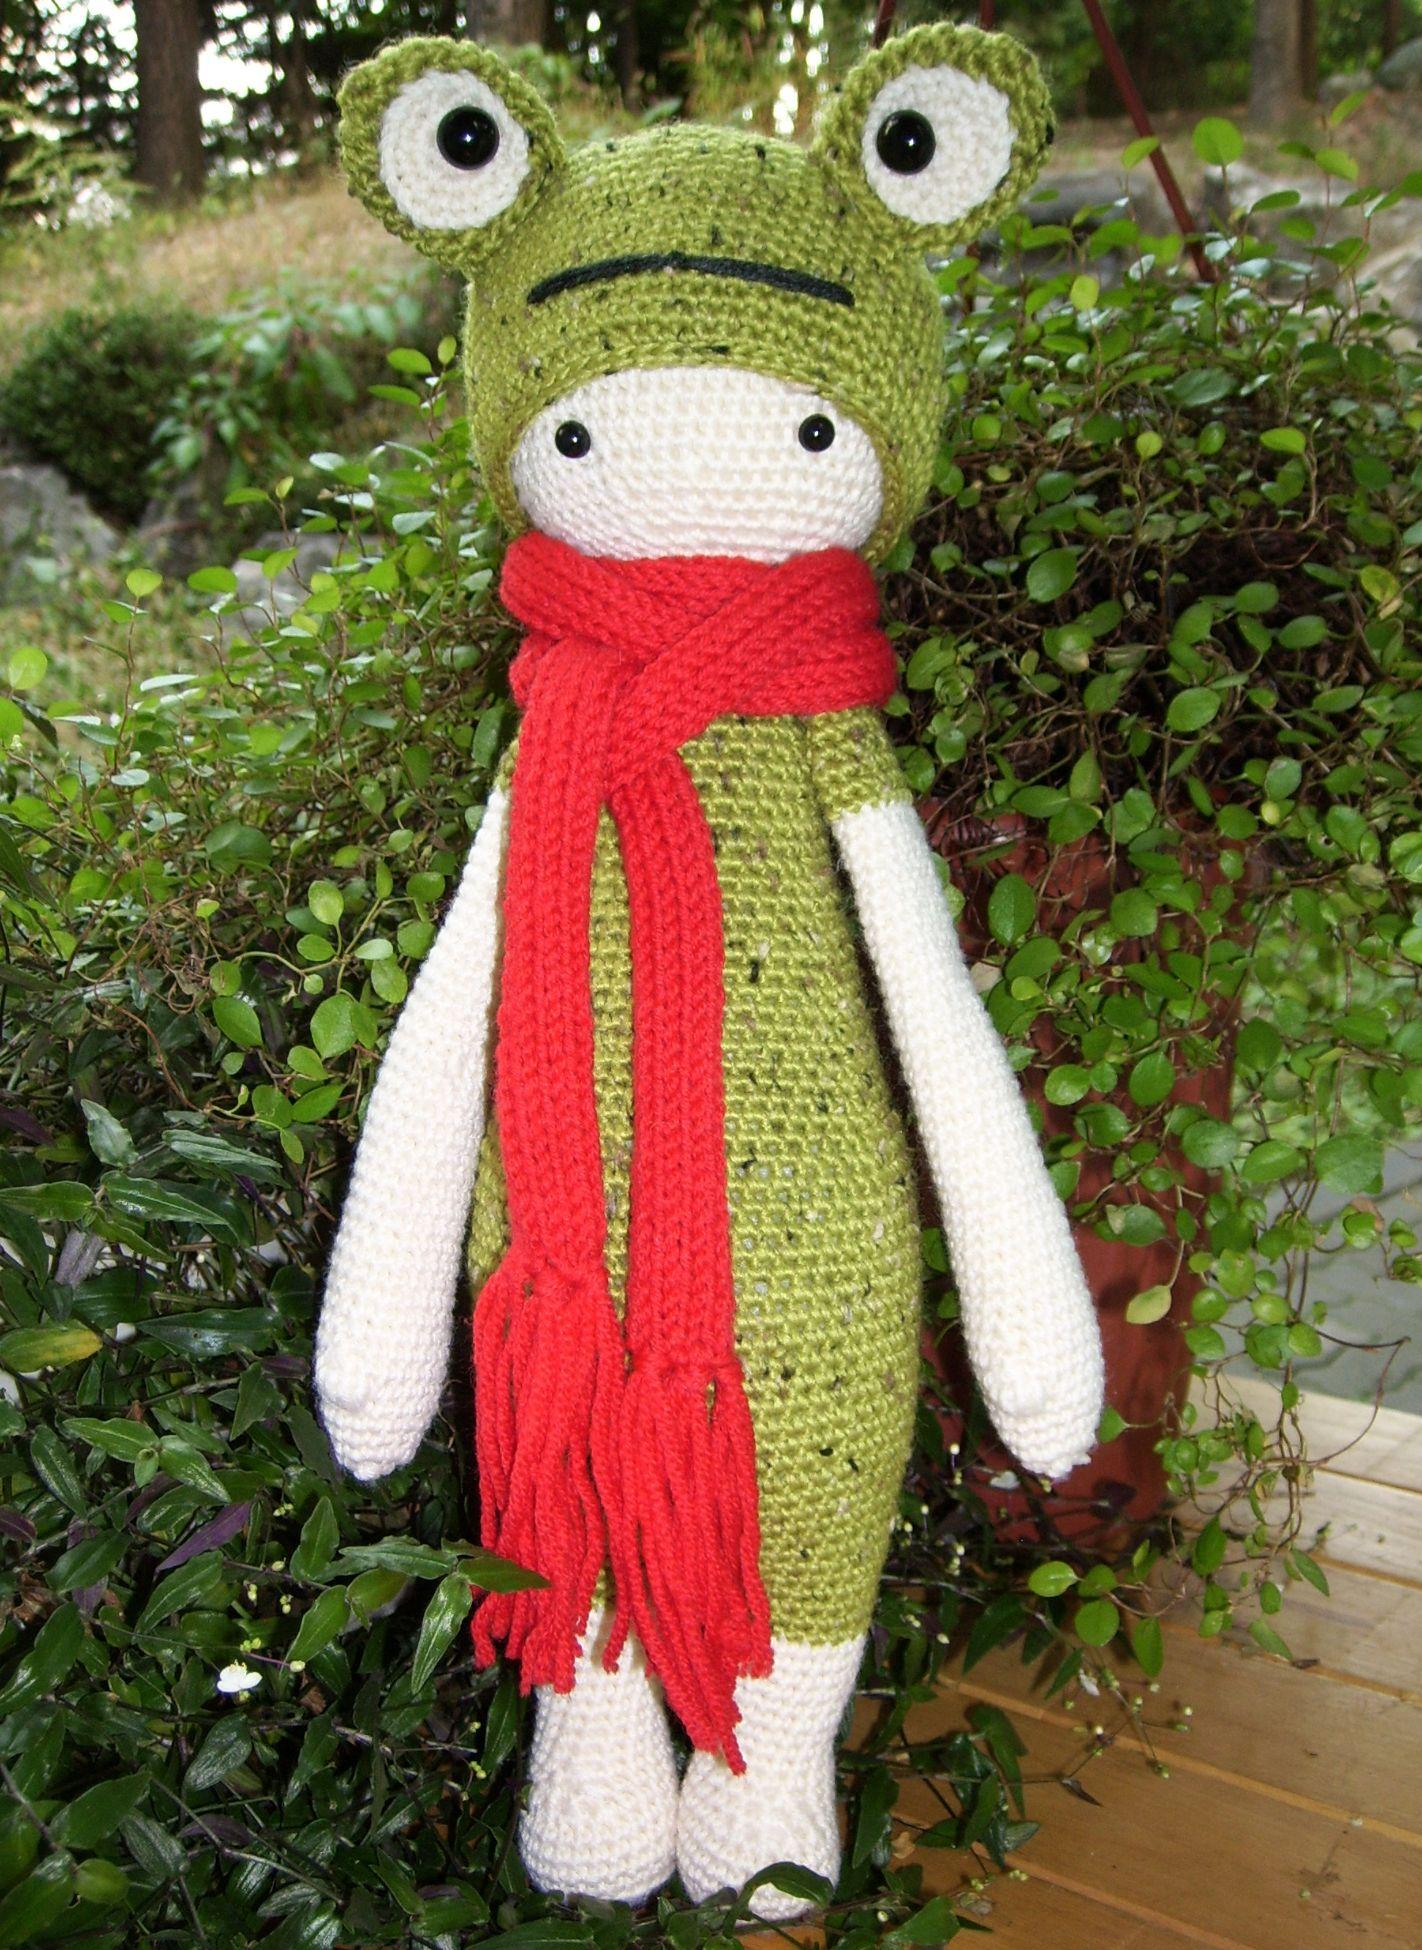 Frog mod made by knit-mania / based on a lalylala crochet pattern ...